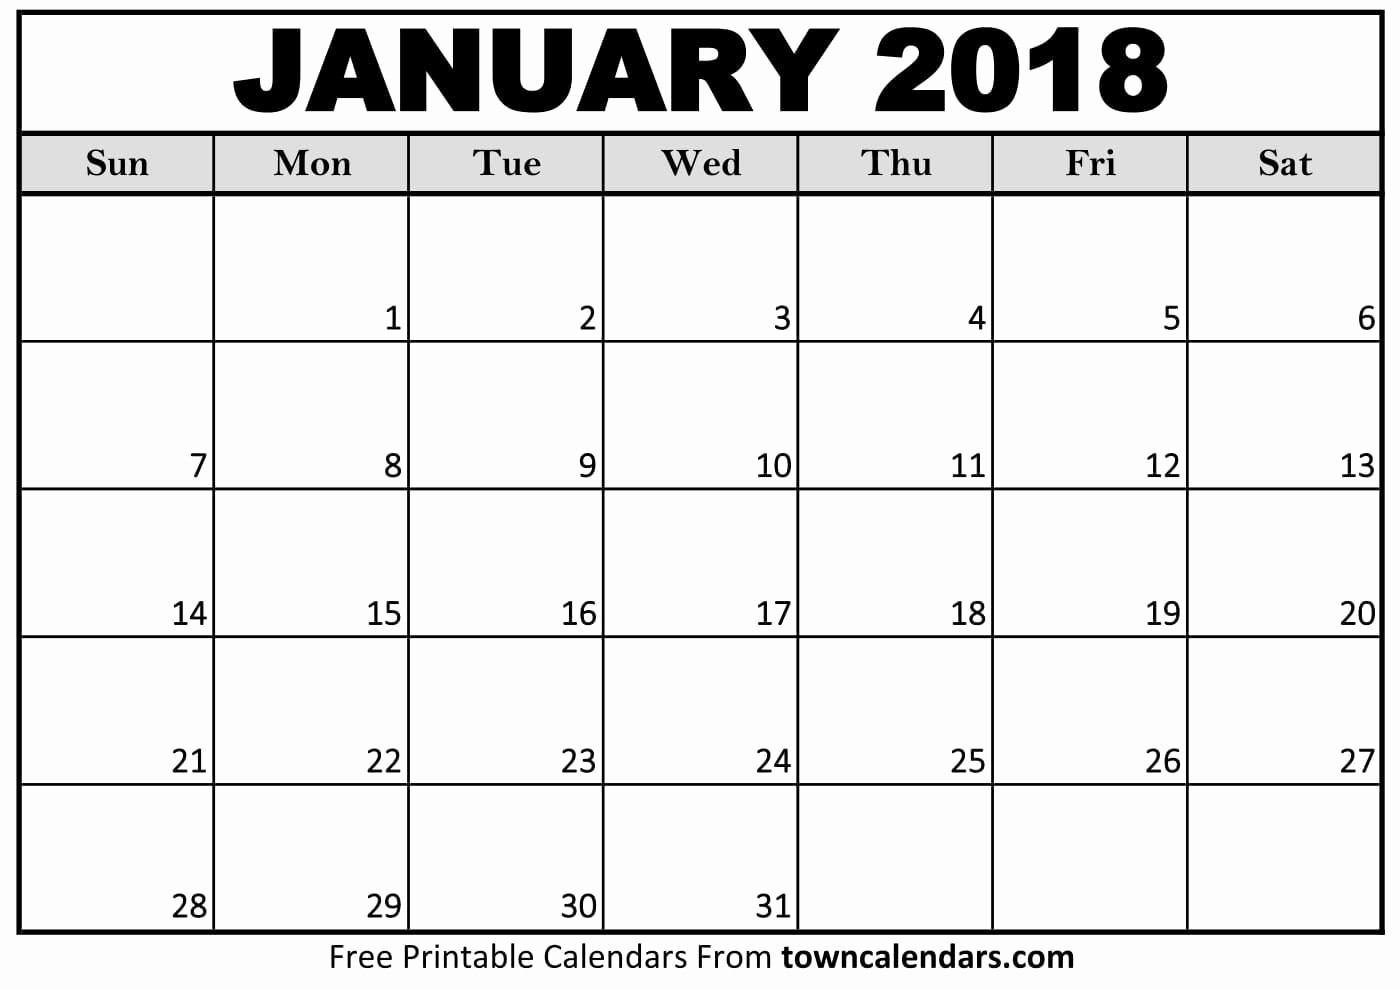 Blank January 2018 Calendar Printable Elegant Blank January 2018 Calendar Printable